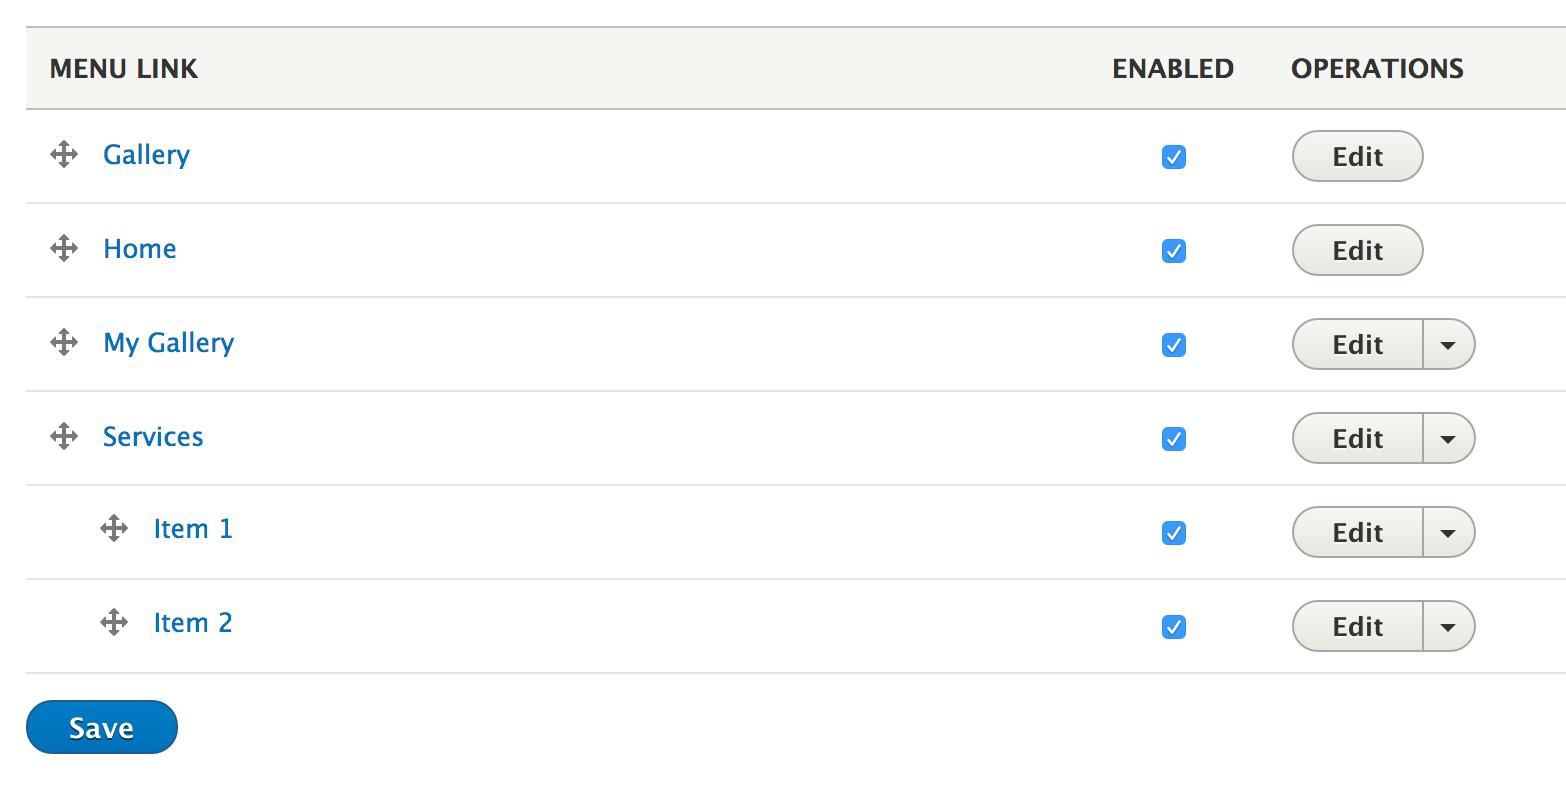 drupal menu templates